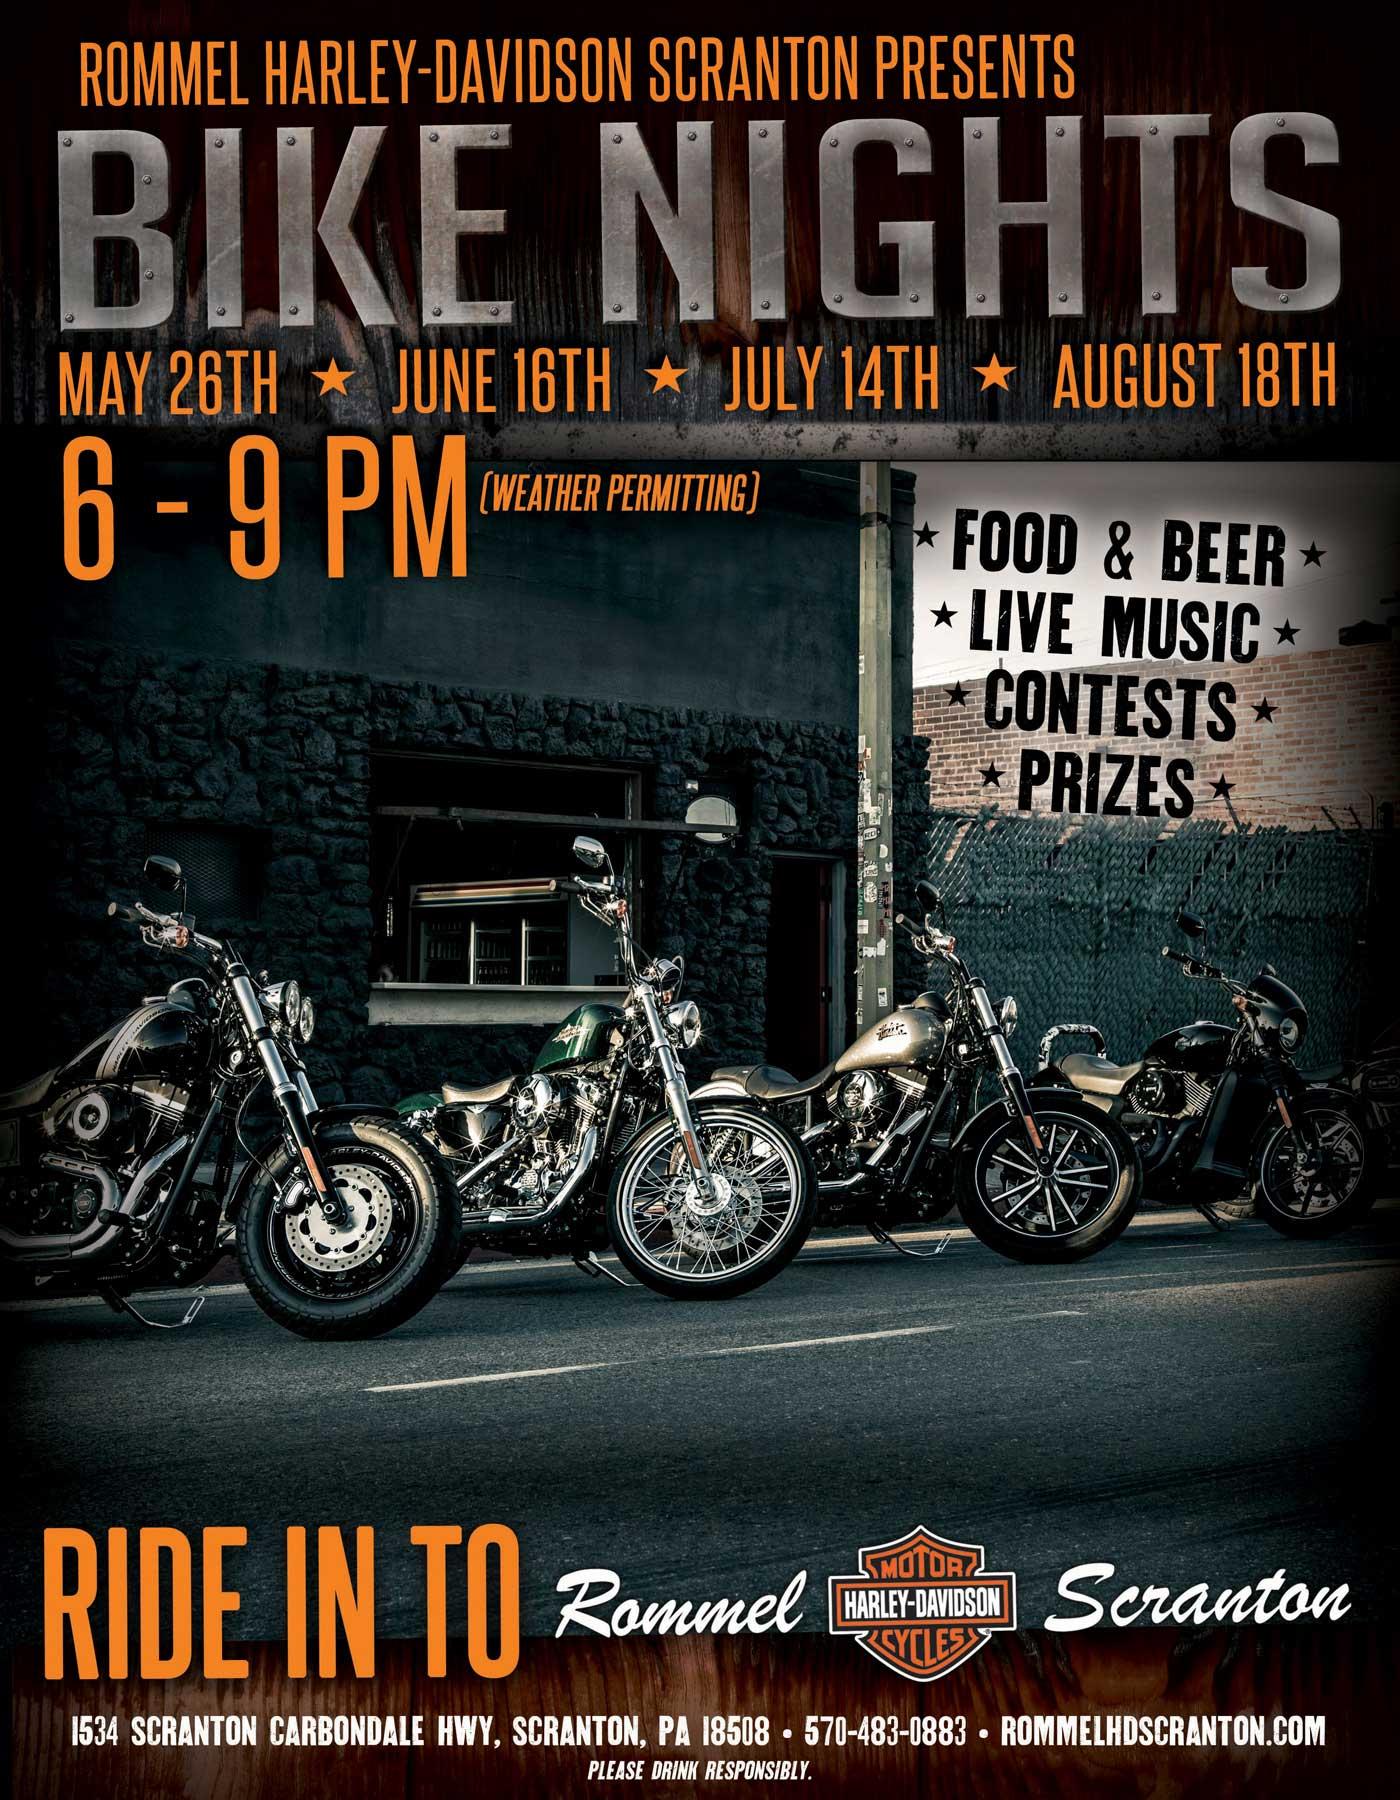 Friday Night Bike Night